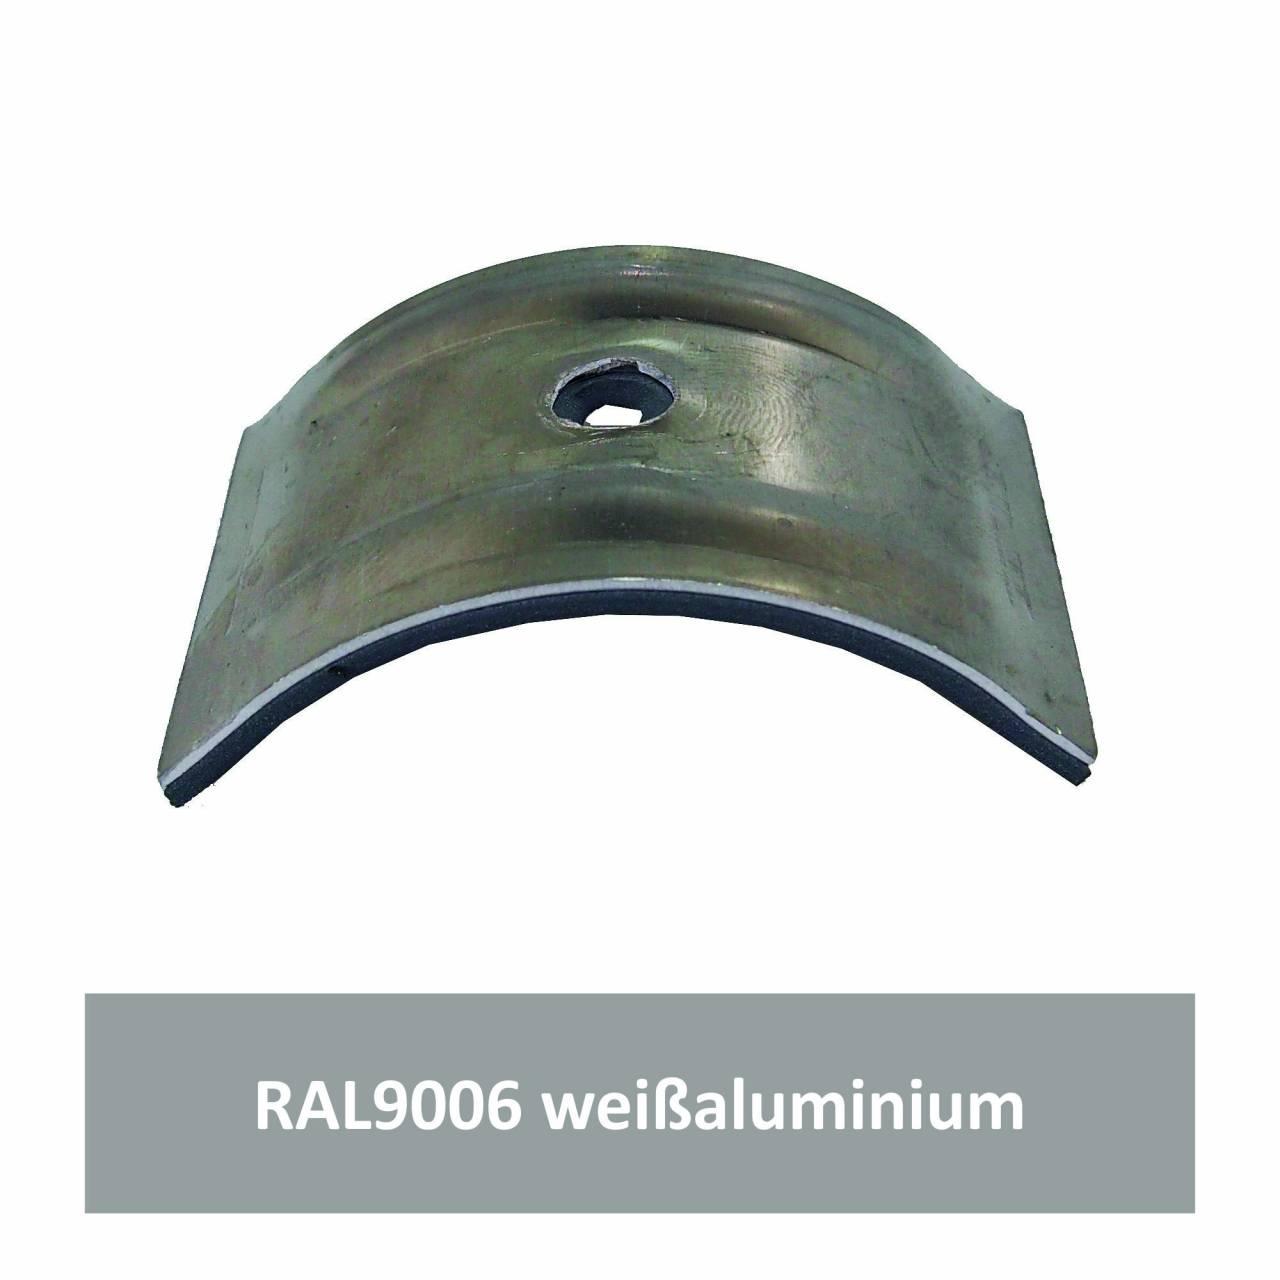 Kalotten für Welle 150/50, Alu RAL9006 weißaluminium / Pck a 100 Stück